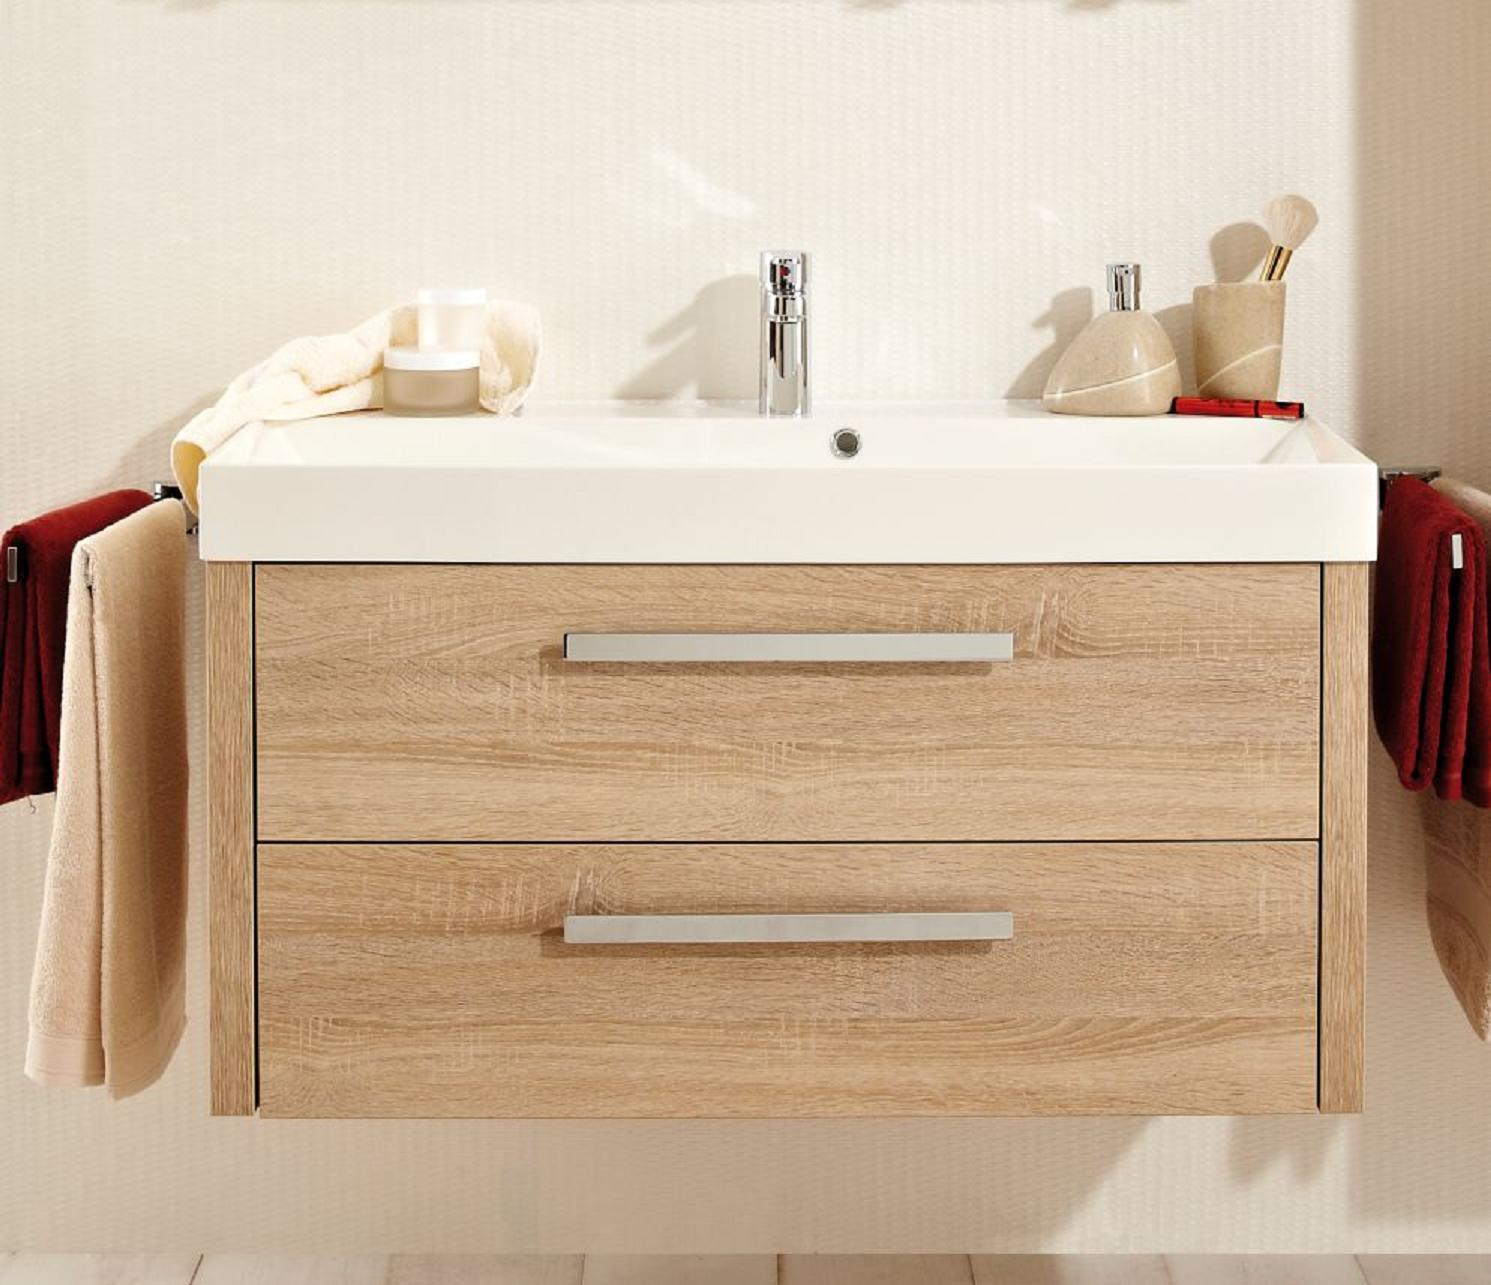 pelipal lardo waschtisch set 100 cm g nstig kaufen m bel universum. Black Bedroom Furniture Sets. Home Design Ideas